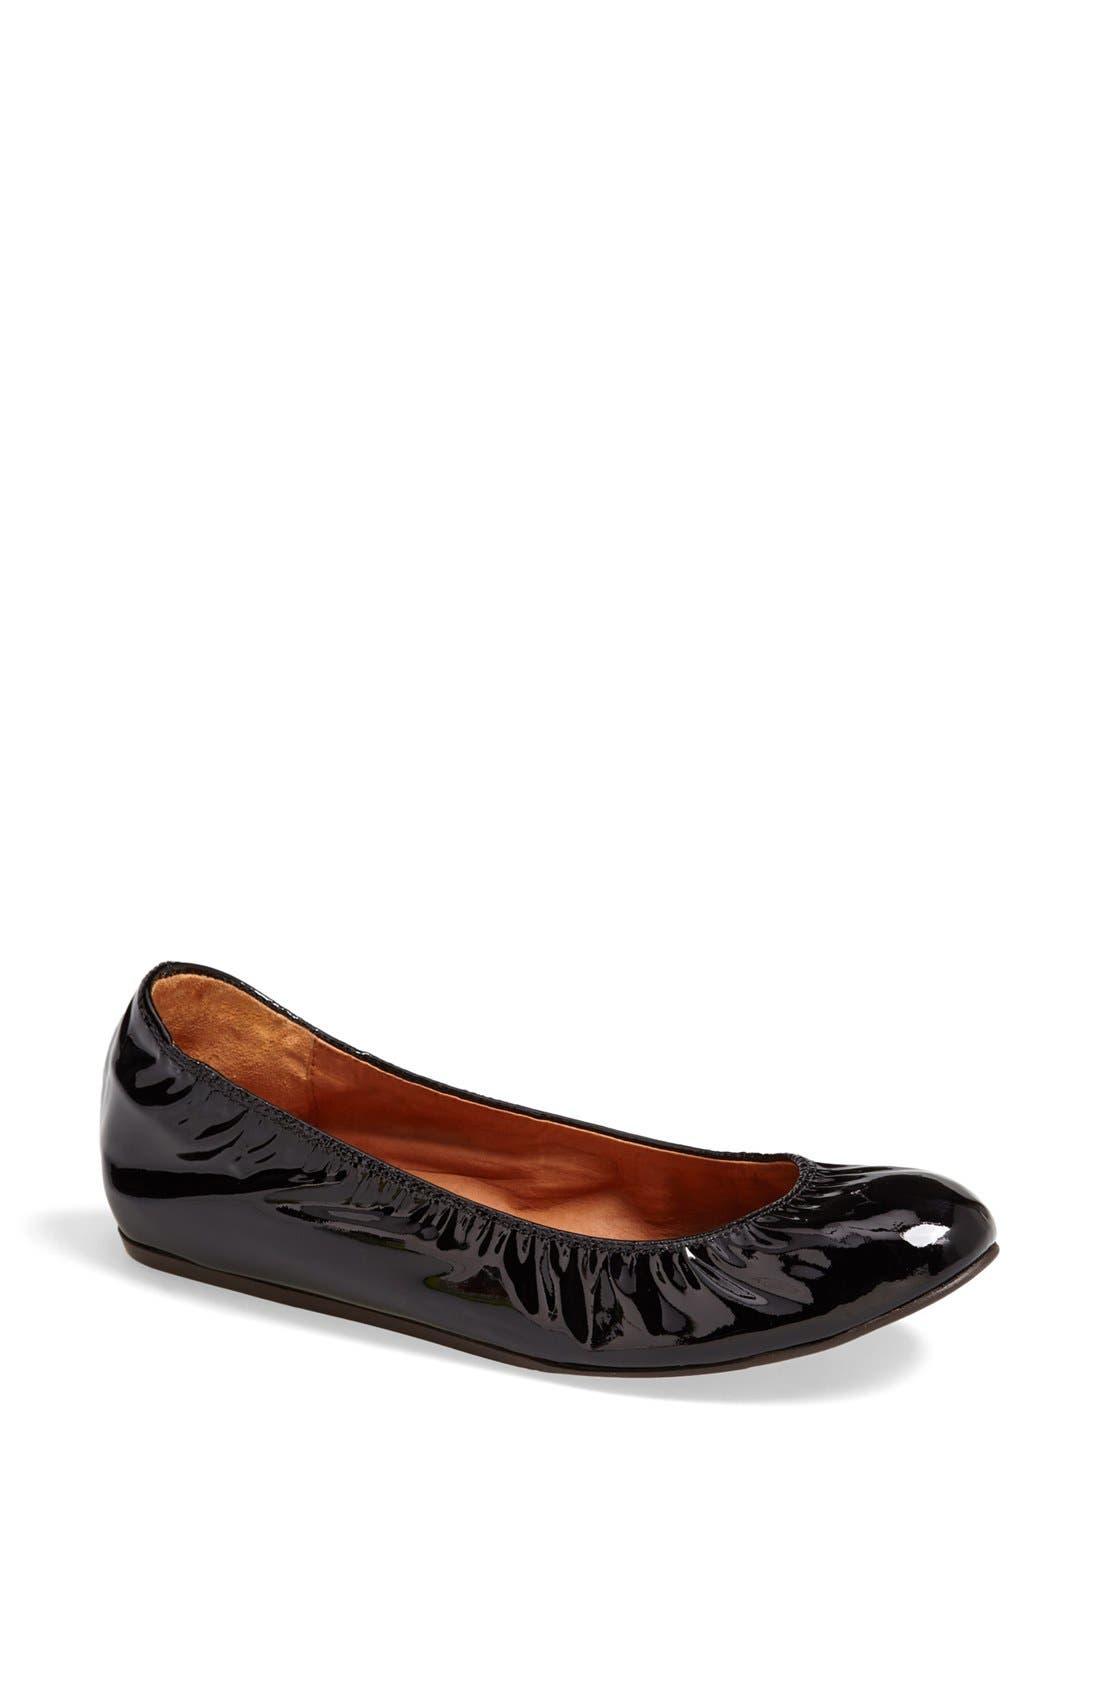 Main Image - Lanvin Patent Leather Ballerina Flat